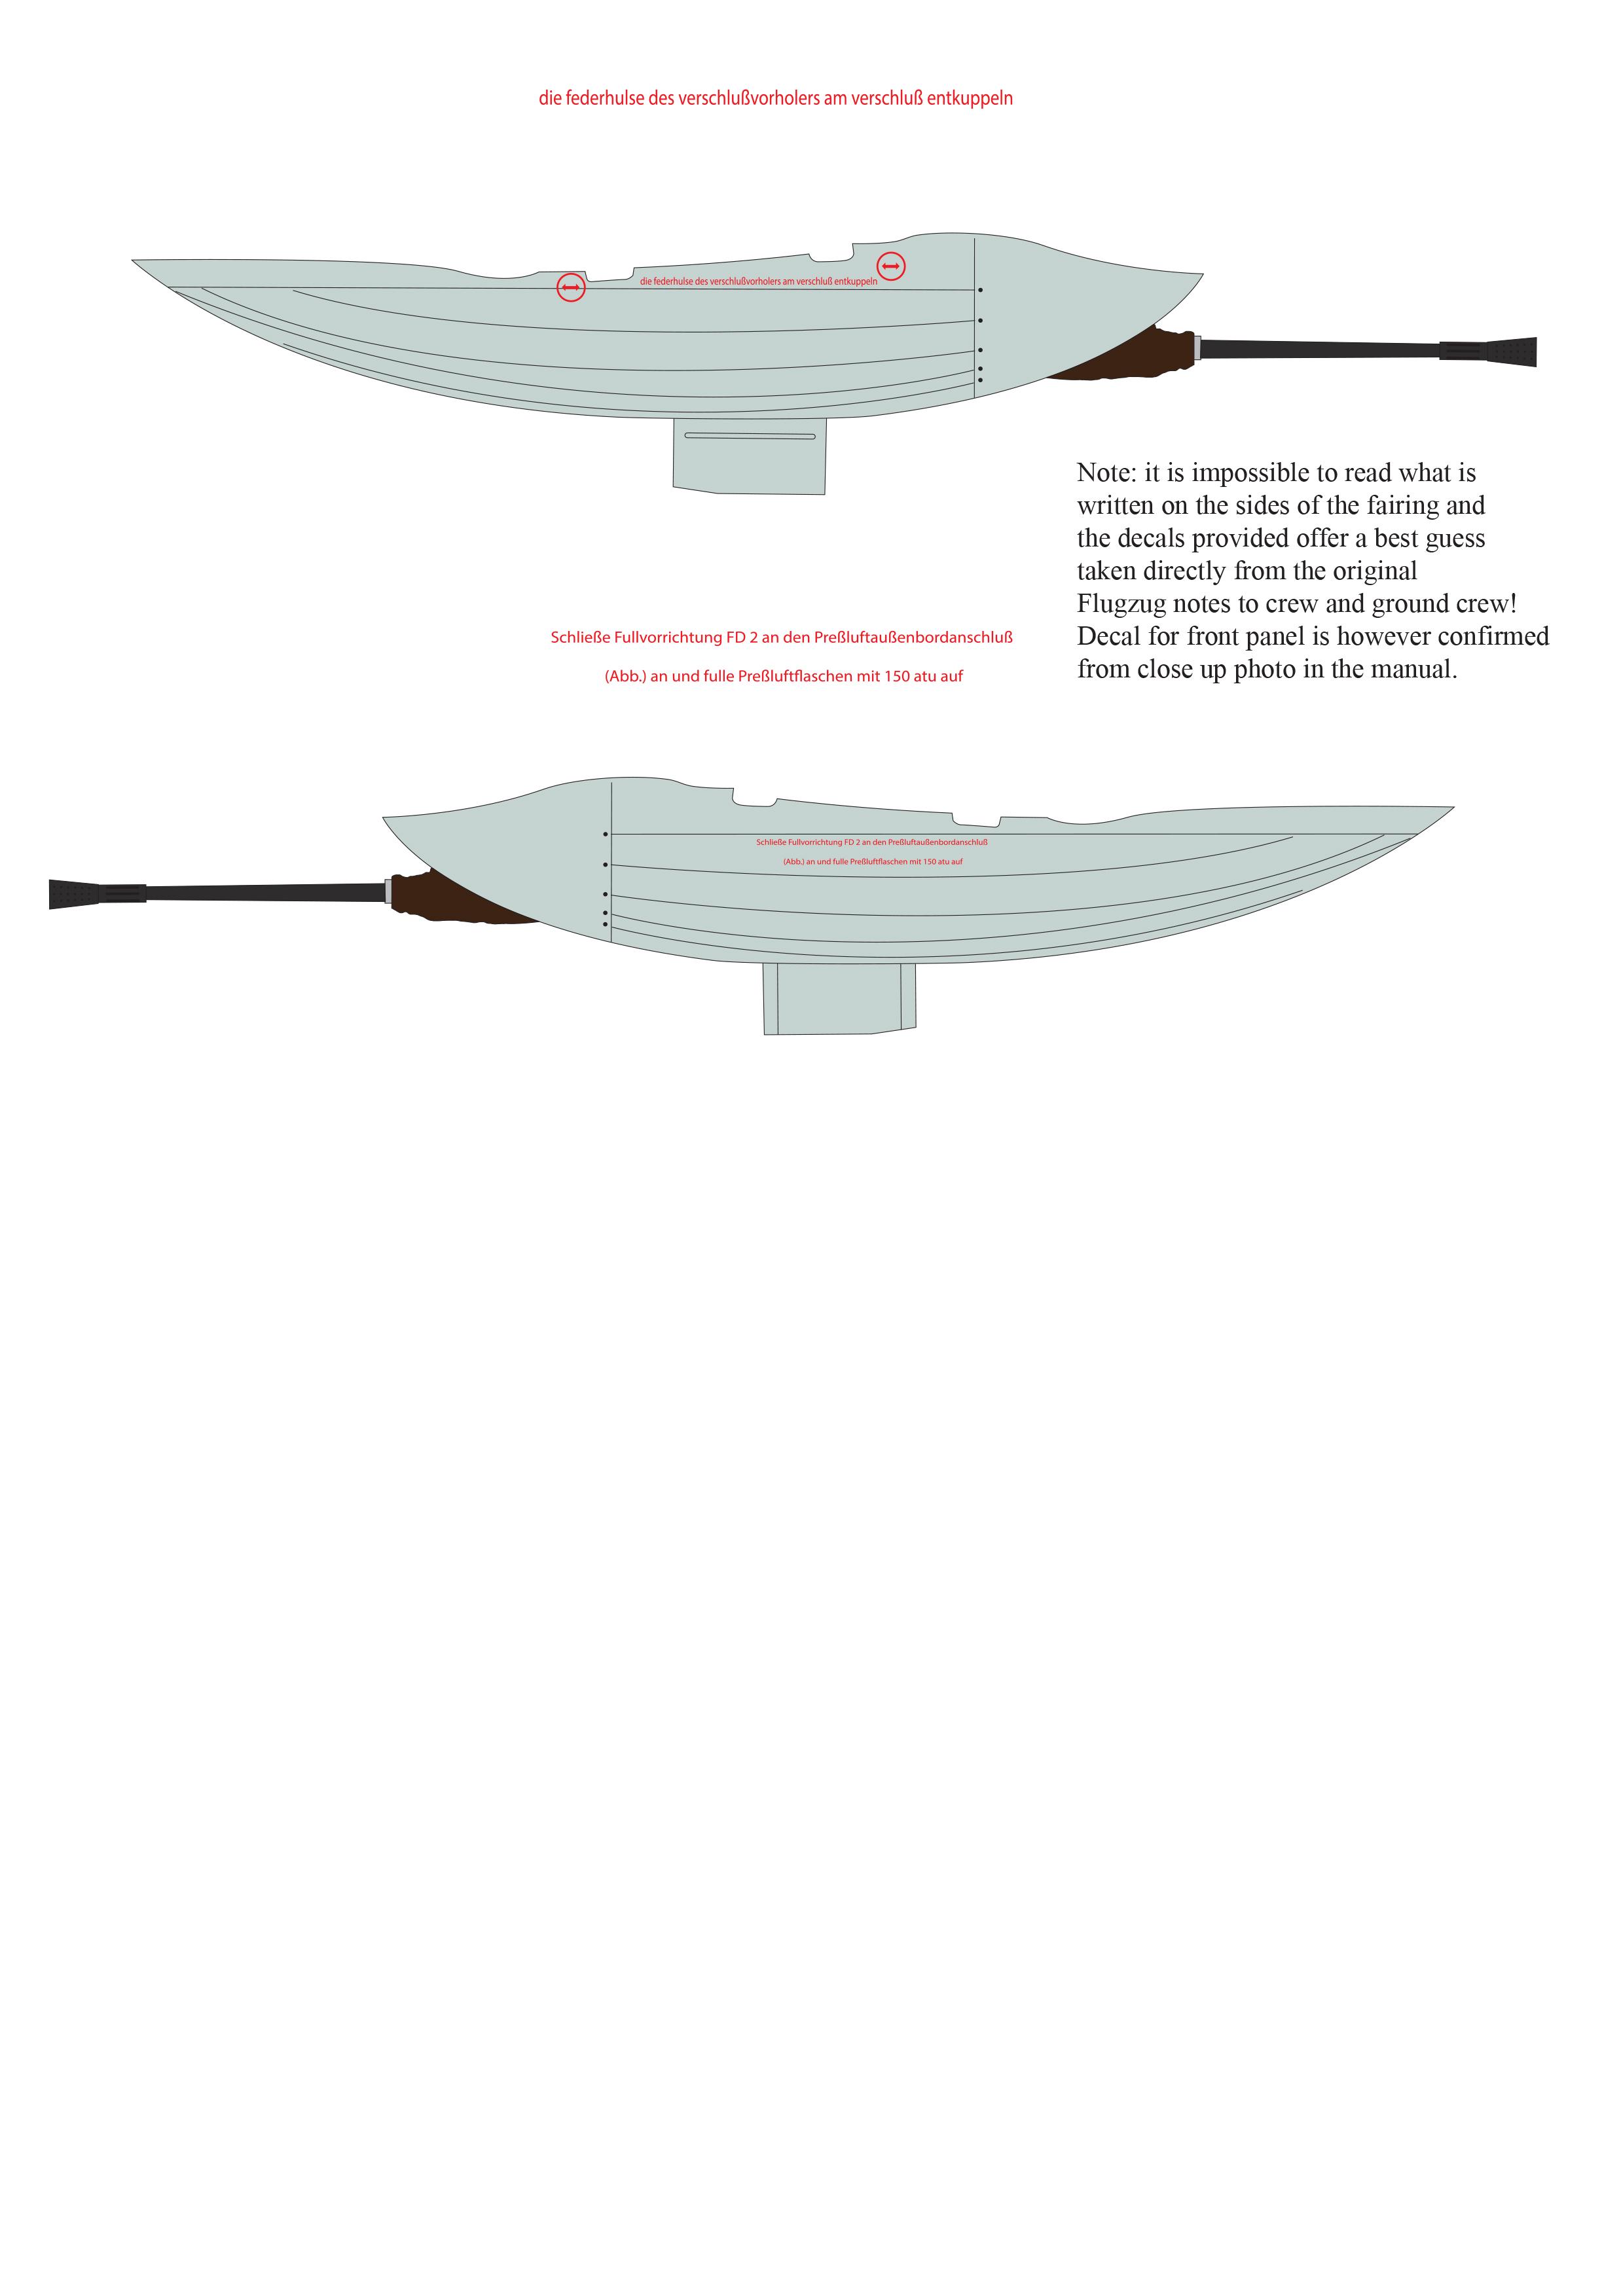 page-5-1-32.jpg